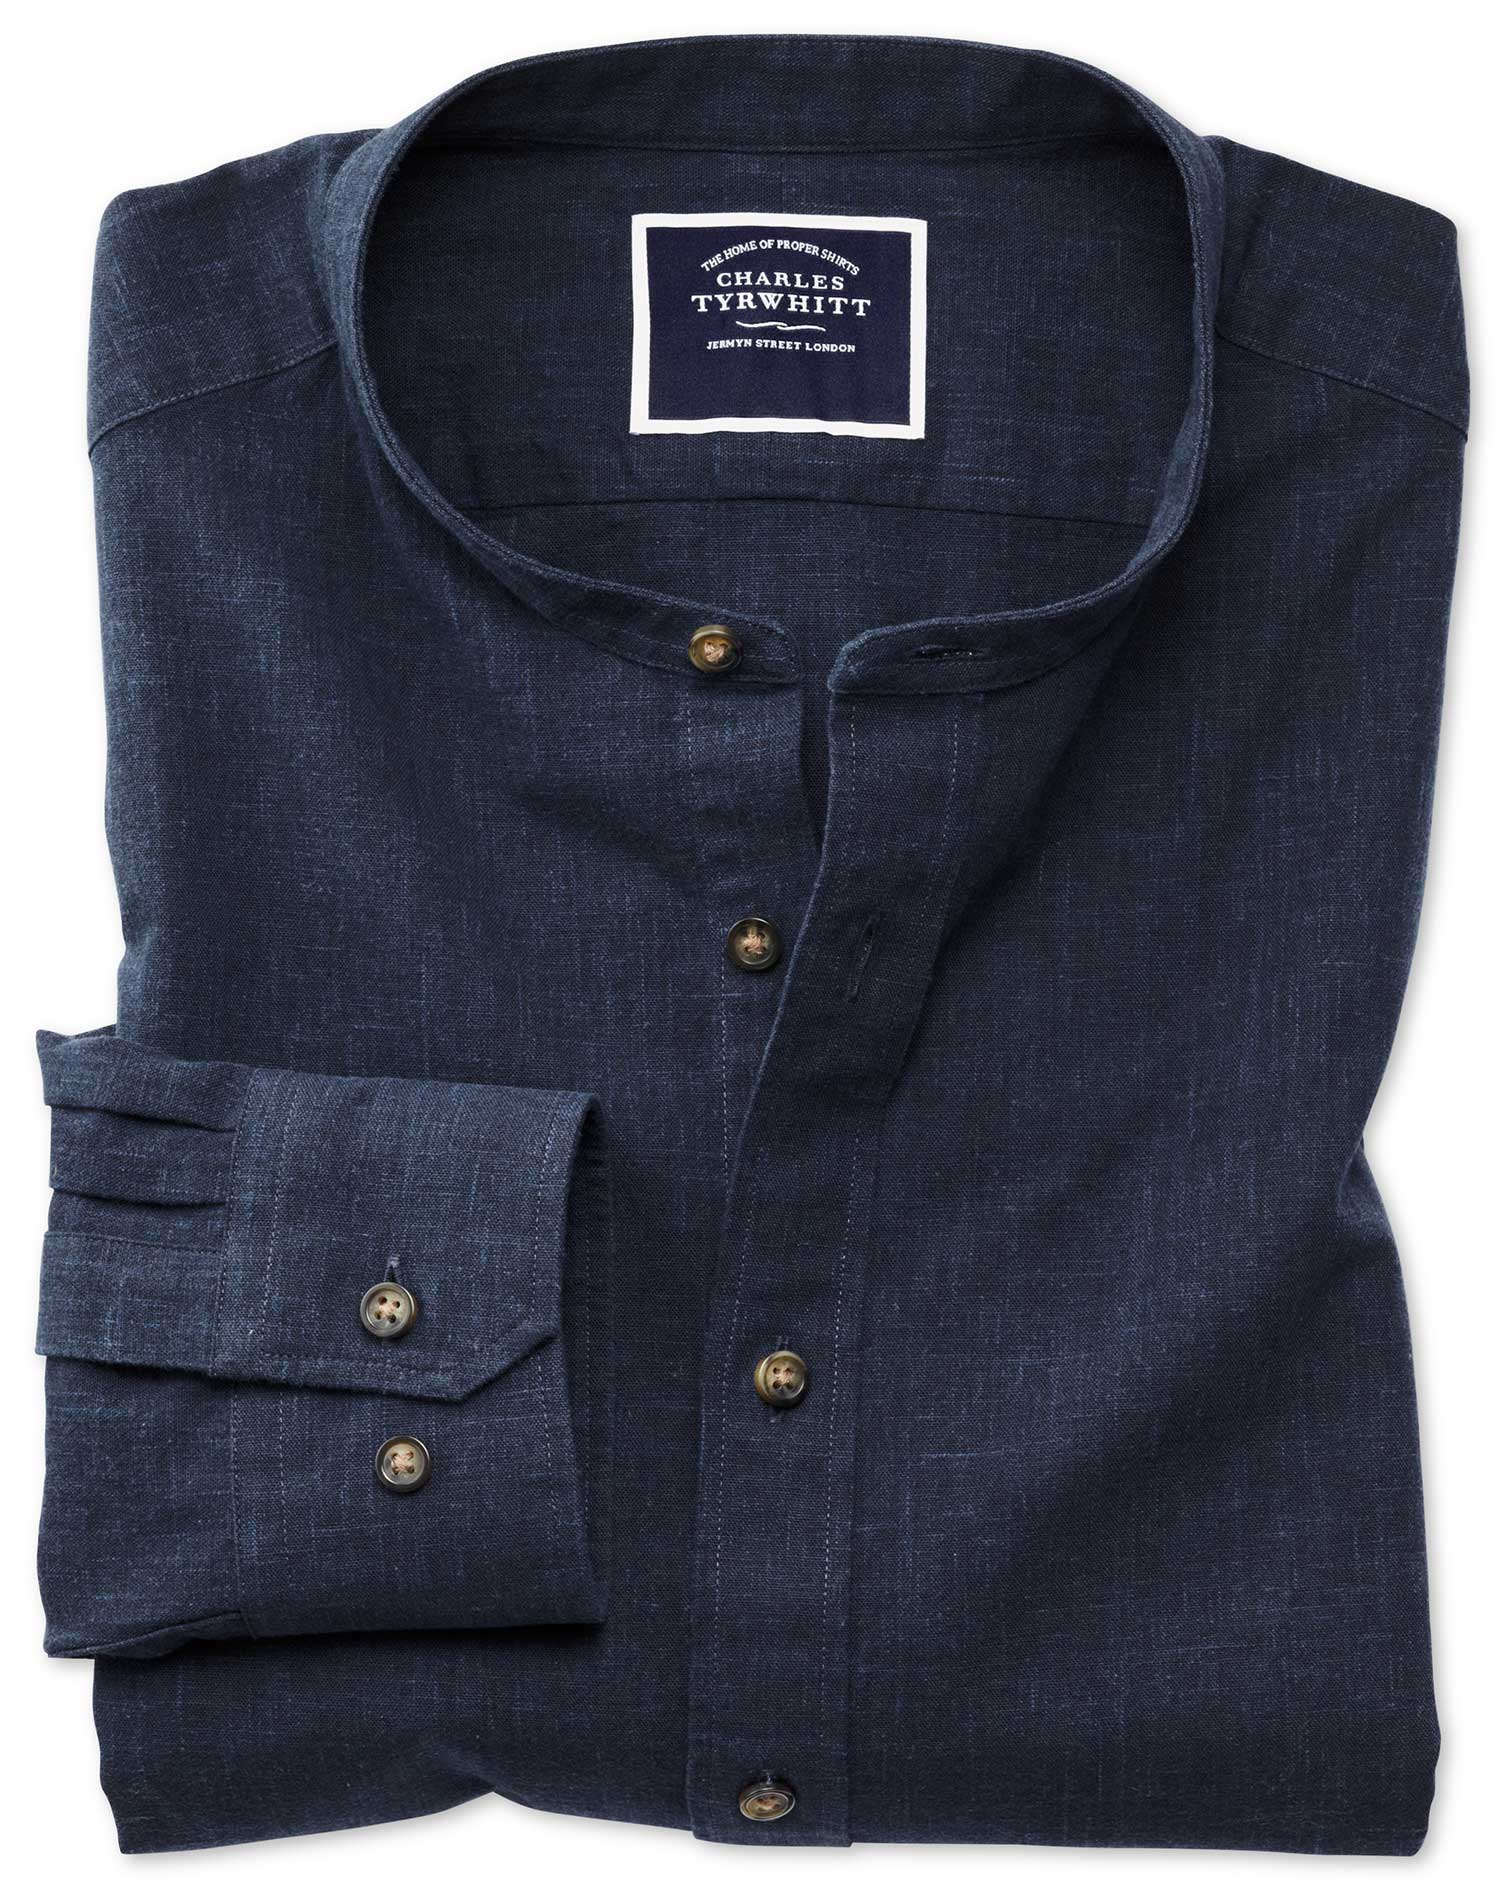 Slim Fit Collarless Navy Blue Cotton Shirt Single Cuff Size Small by Charles Tyrwhitt